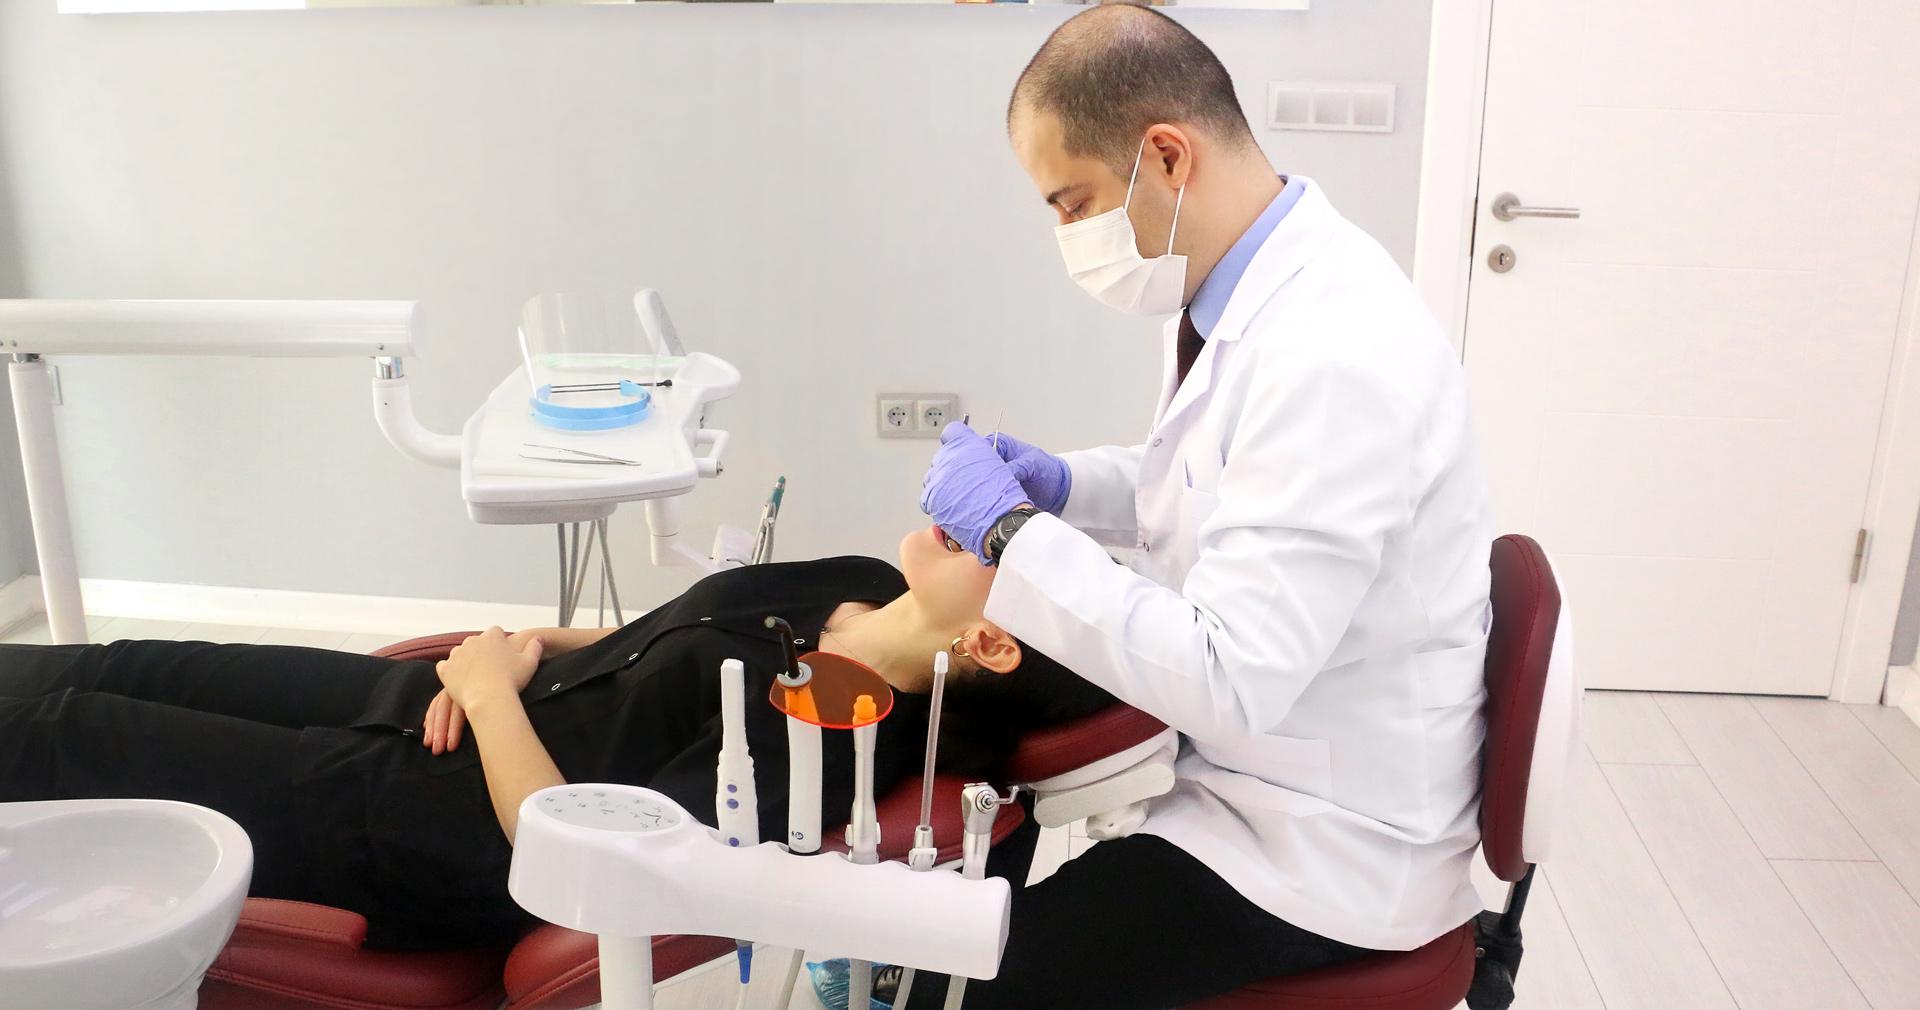 Trabzon Ortodonti Kliniği